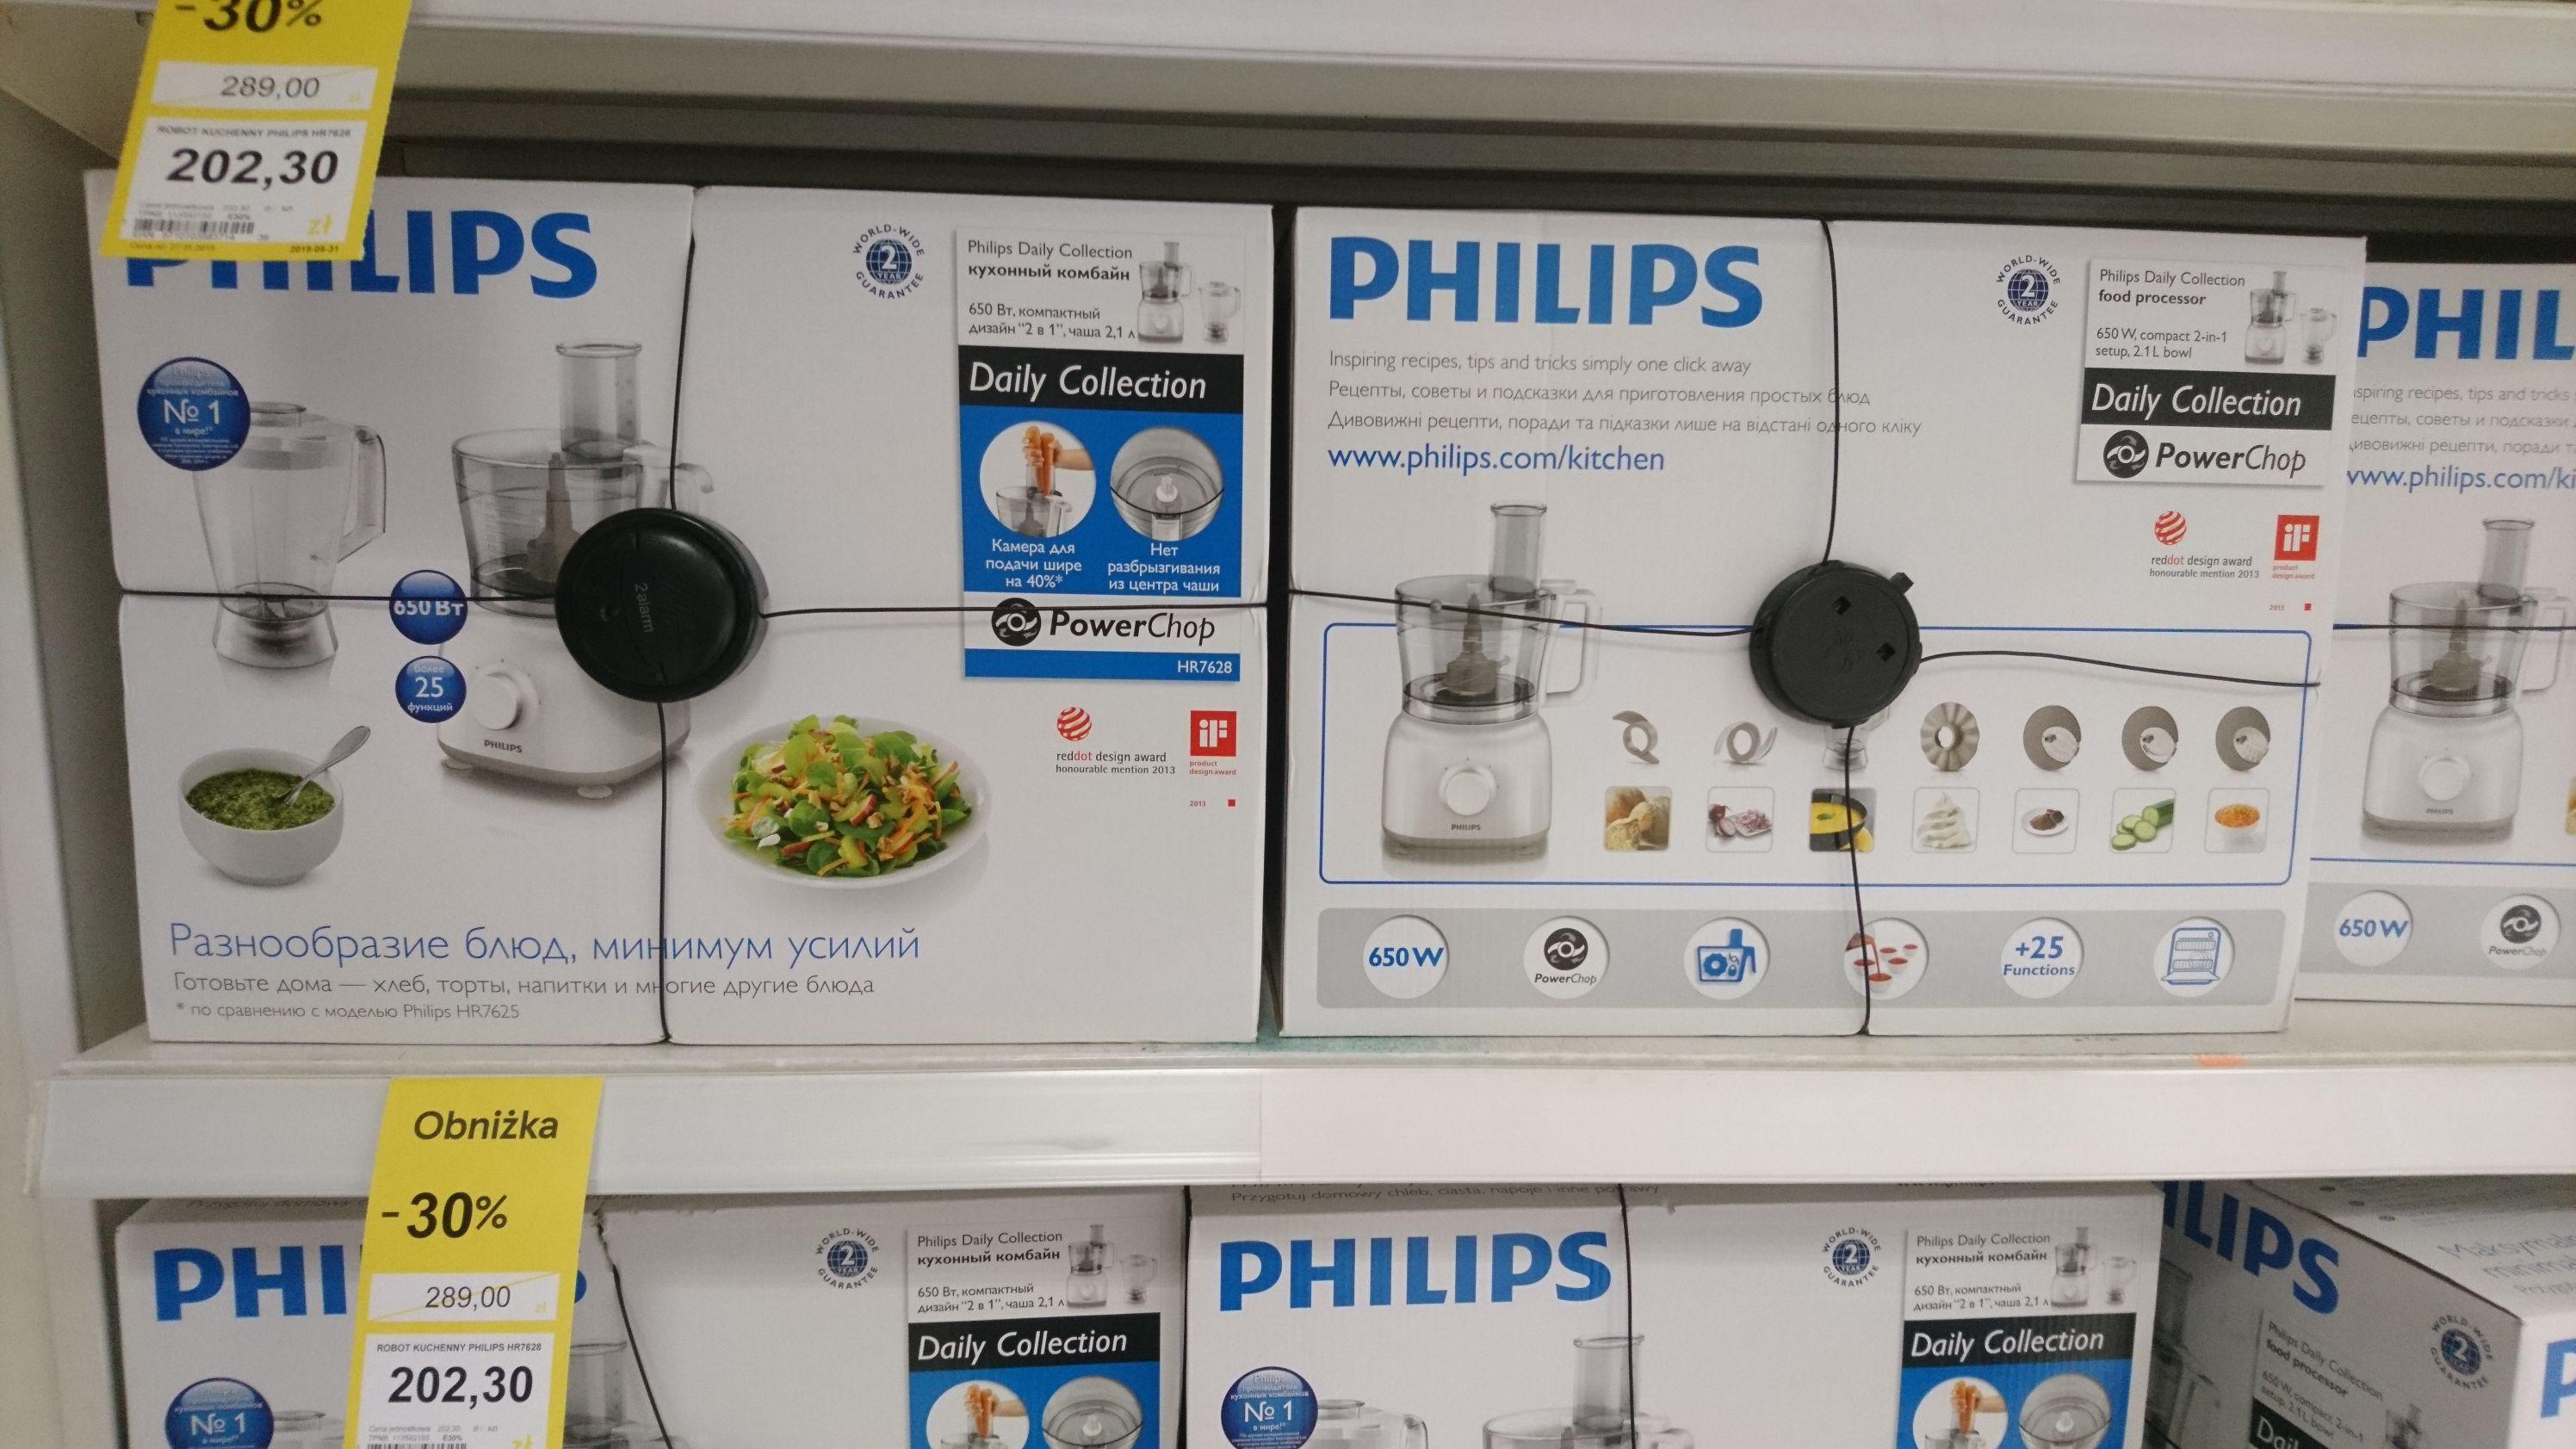 Tesco Malakser/Robot kuchenny Philips HR7628 Kielce